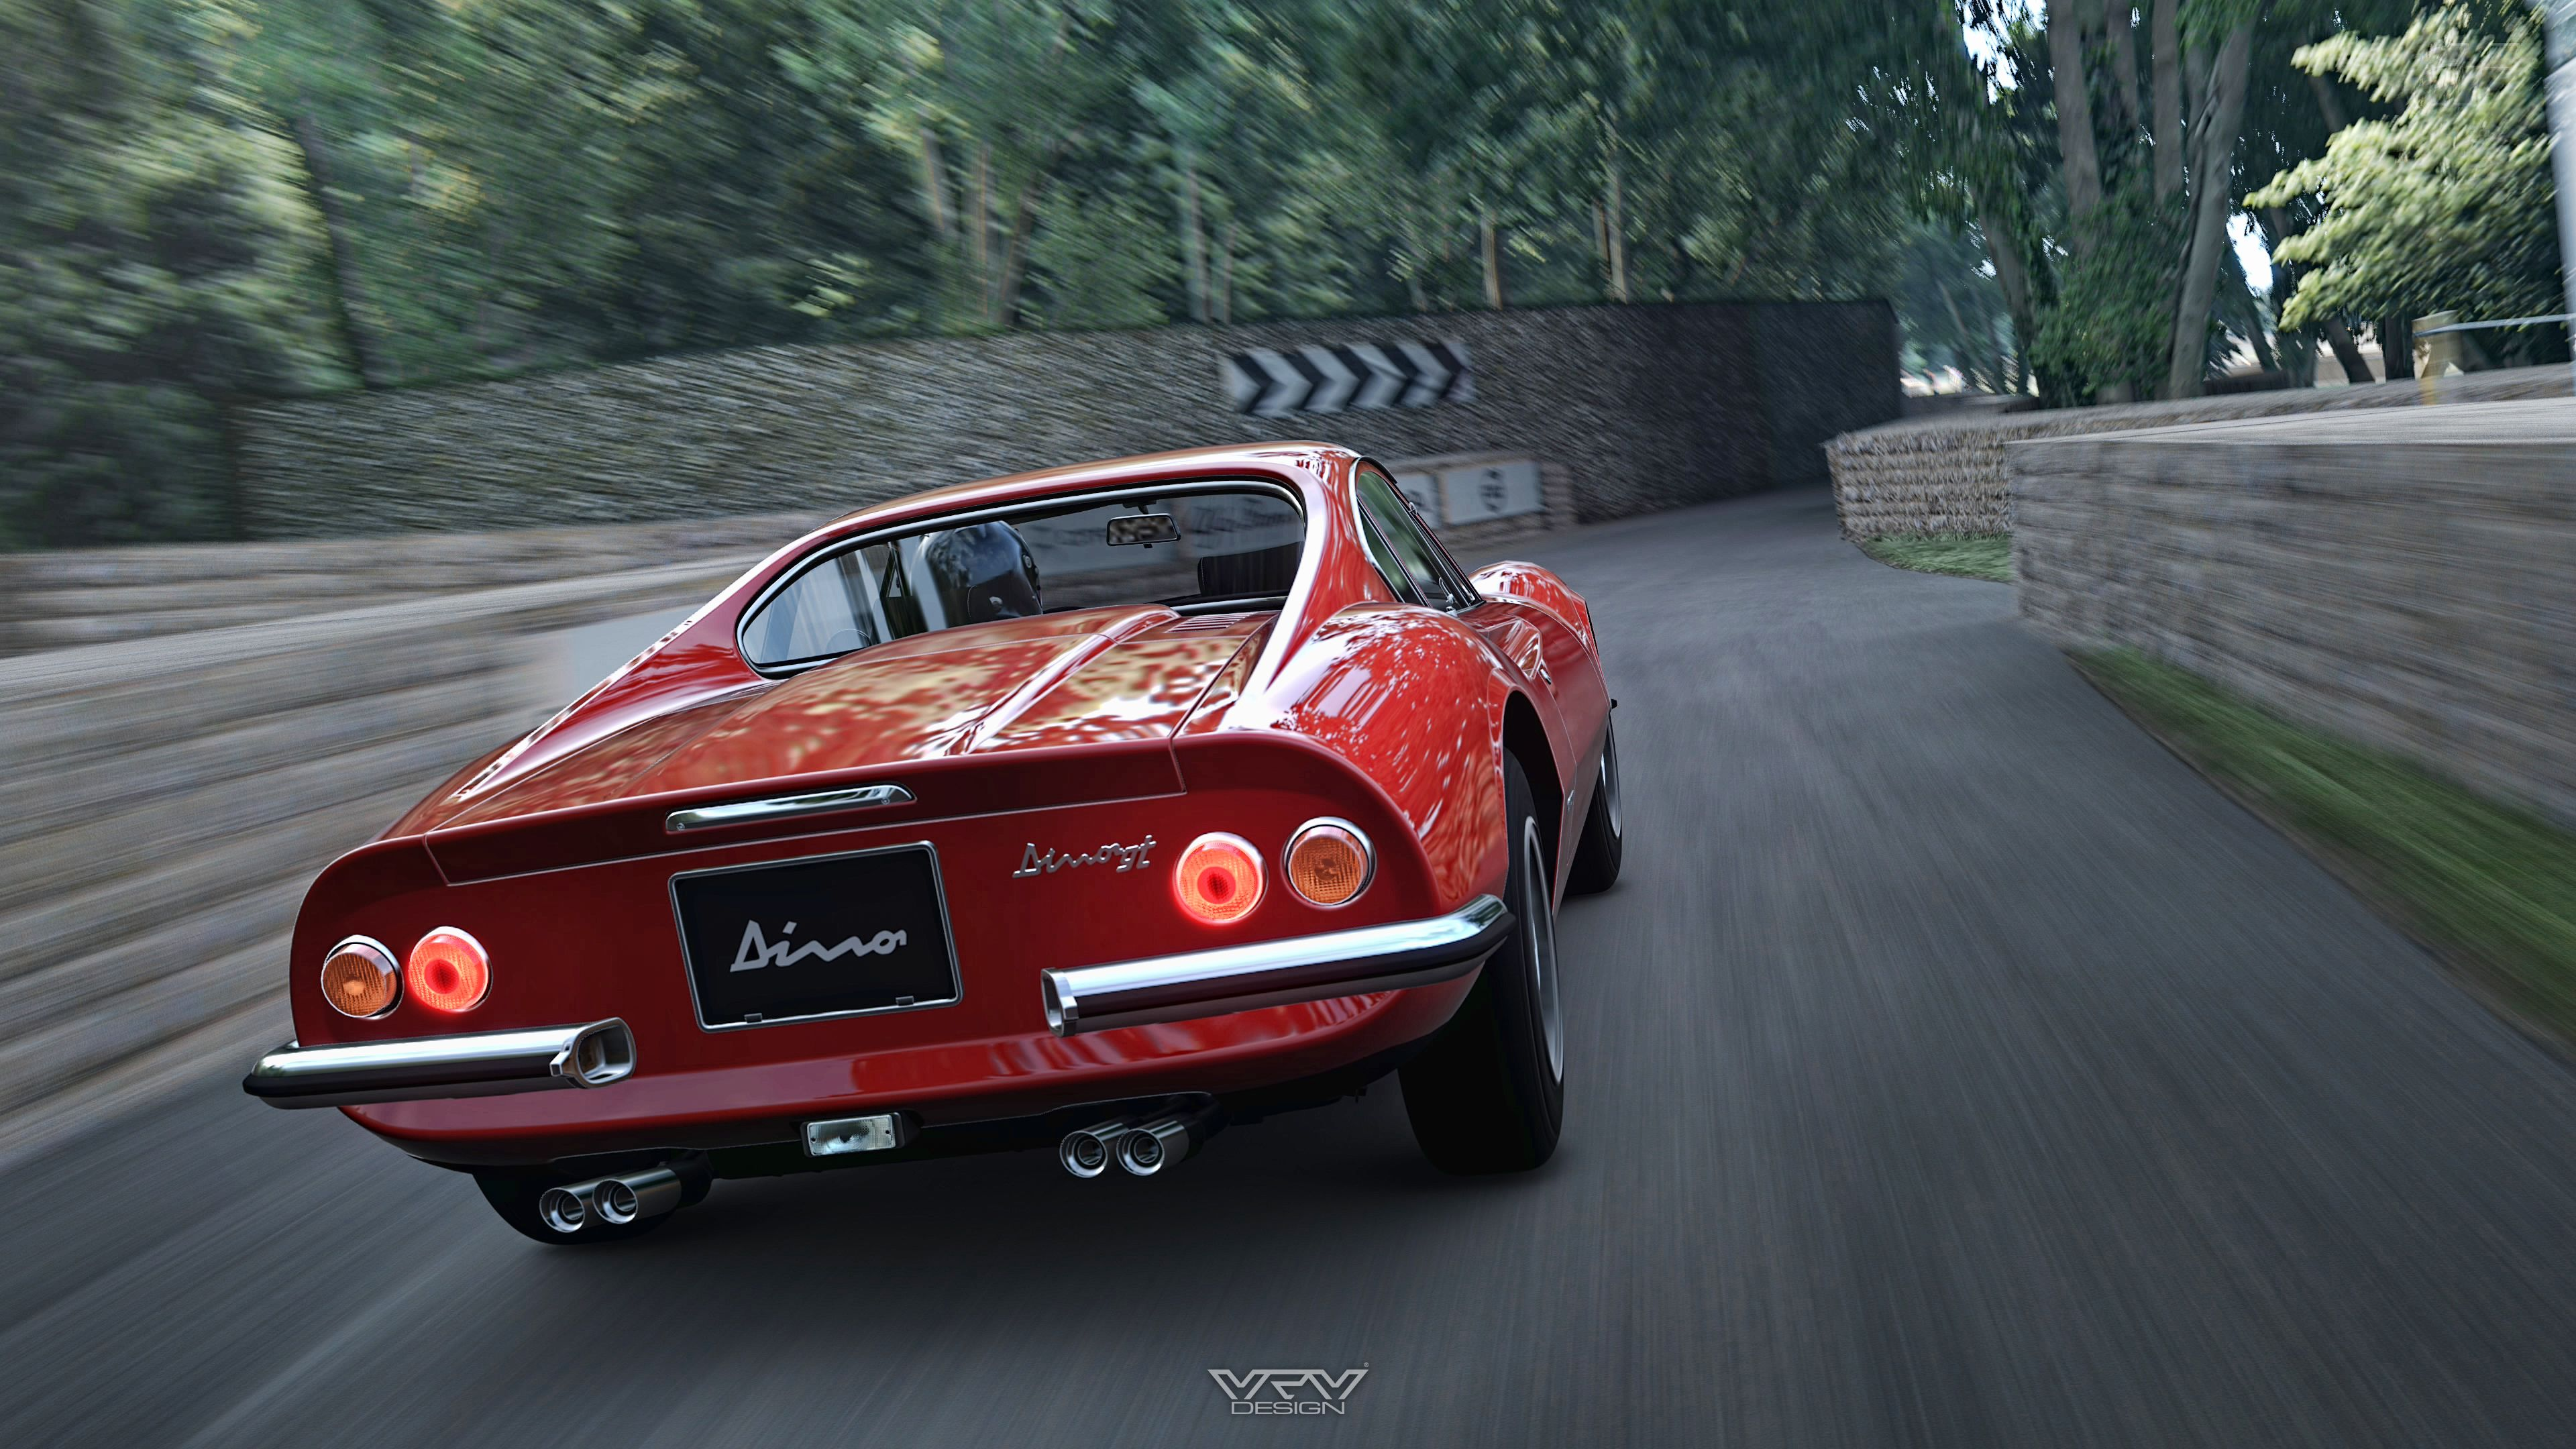 Classic Ferrari Wallpapers Top Free Classic Ferrari Backgrounds Wallpaperaccess